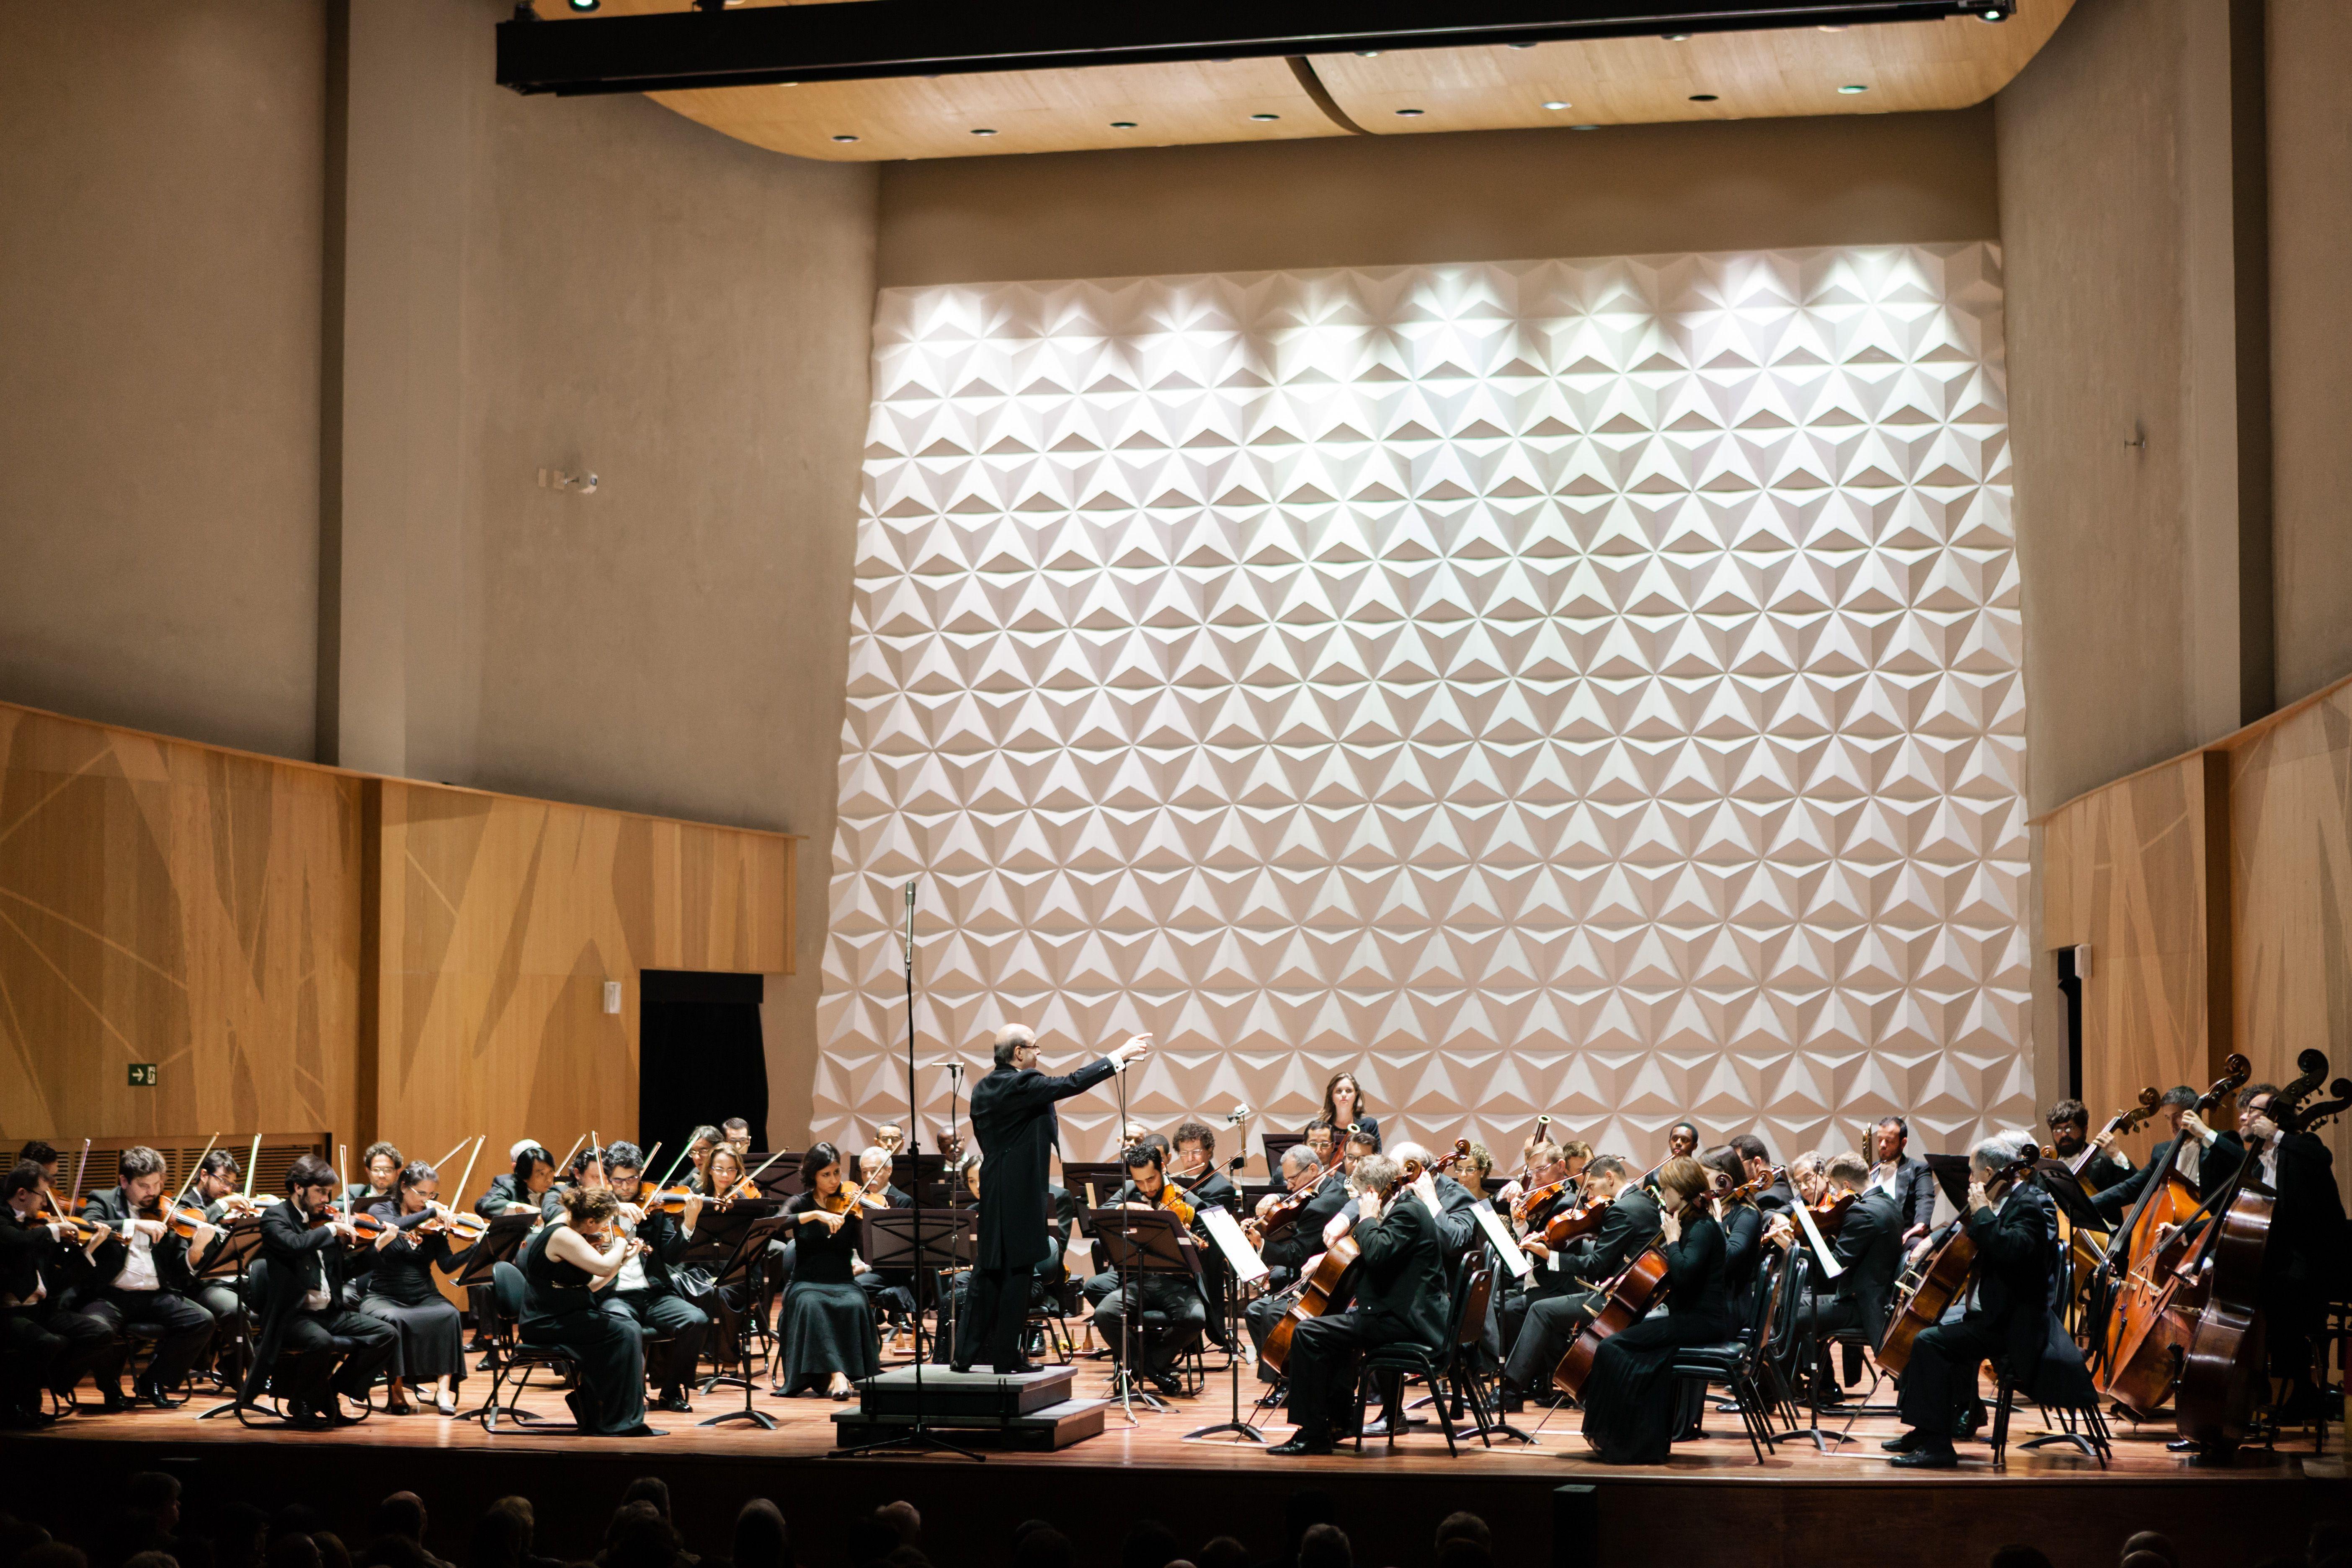 O maestro Roberto Tibiriçá rege a OSB na Sala Cecília Meireles em um concerto dedicado a Beethoven. Foto: Cicero Rodrigues